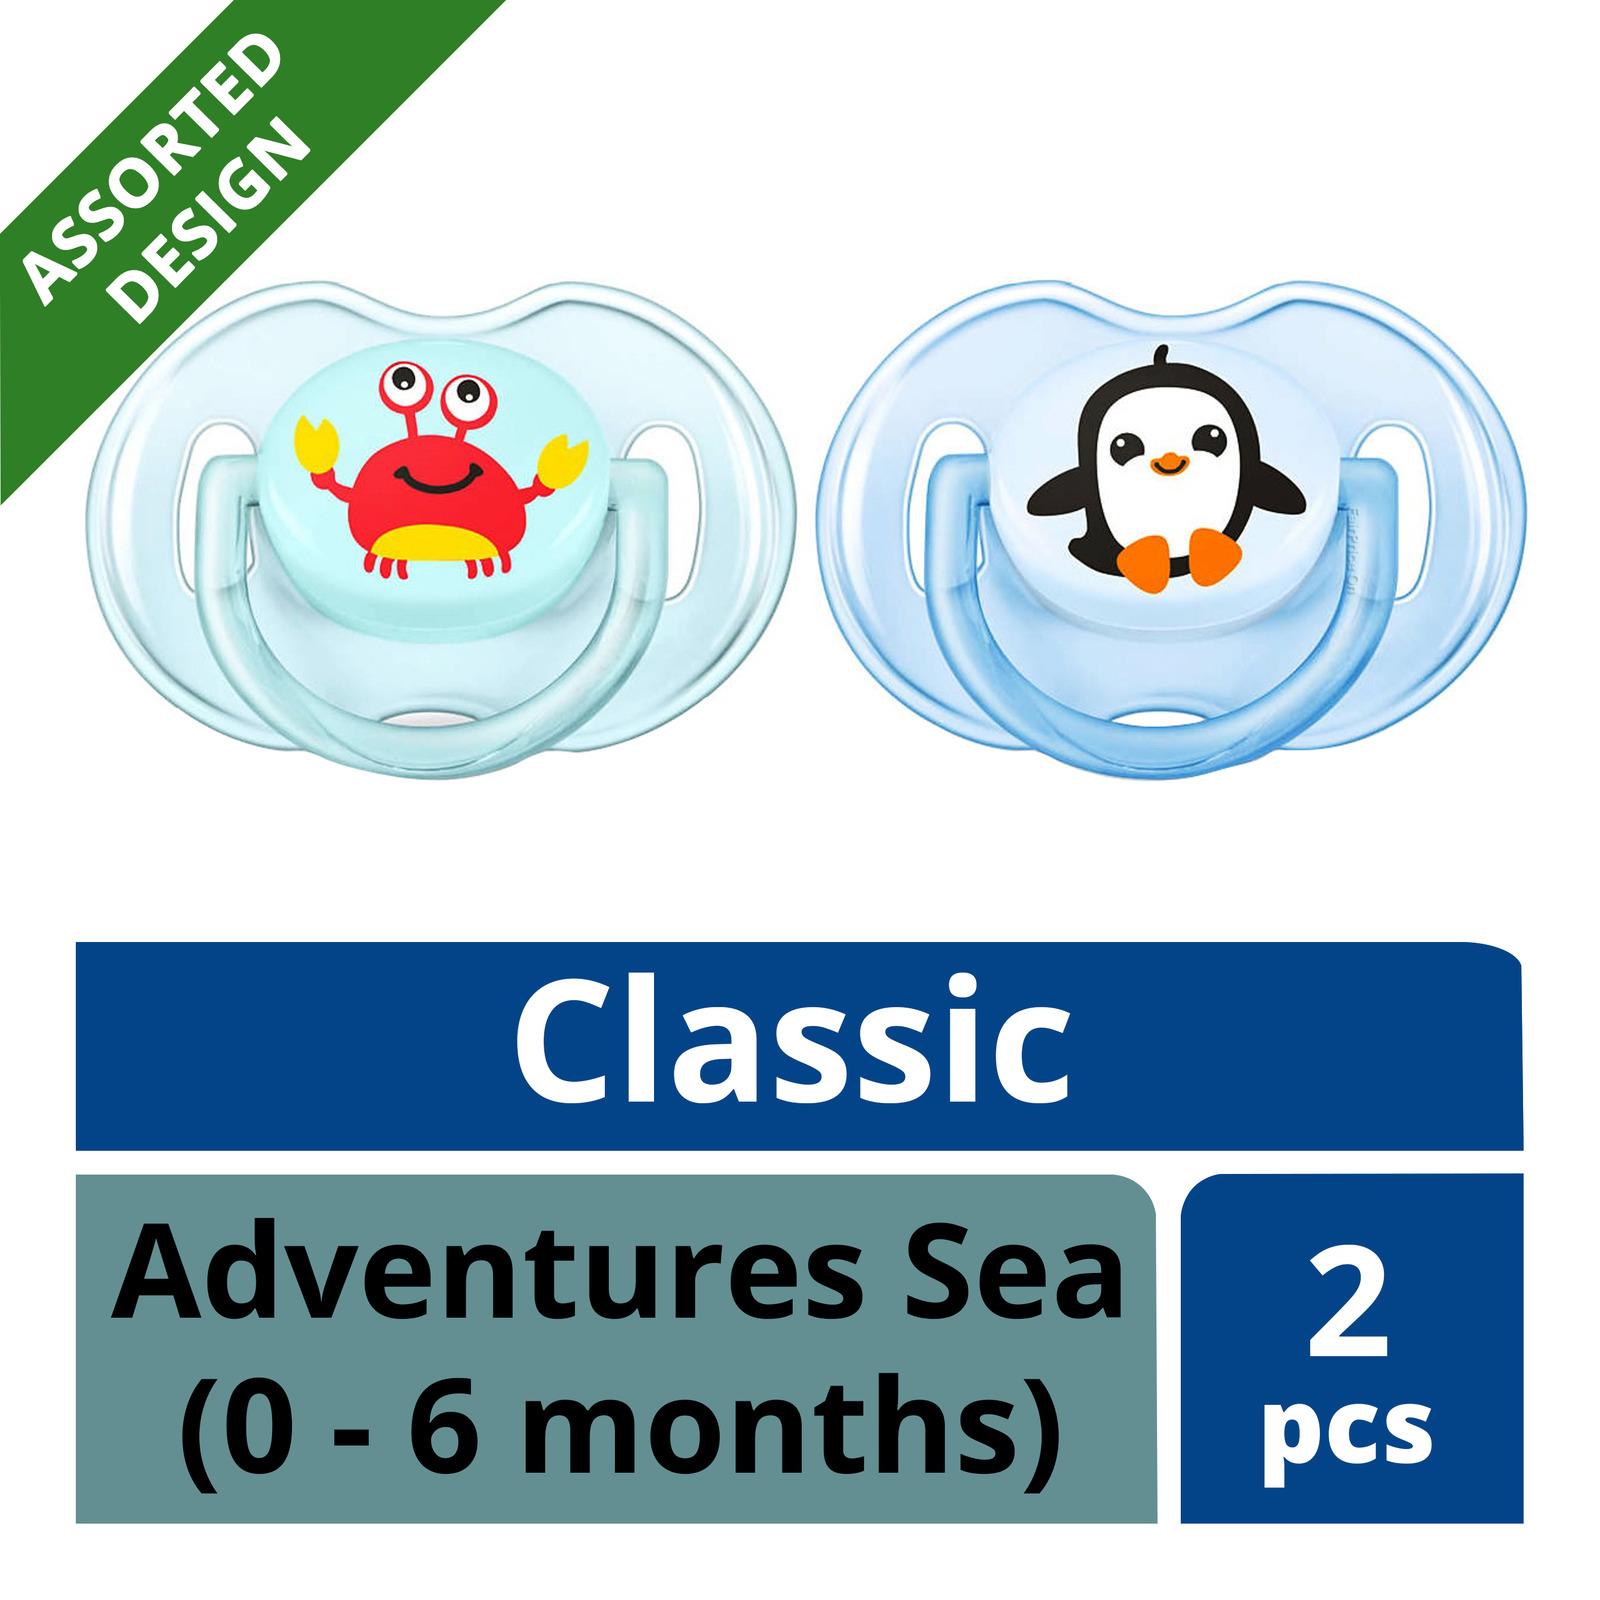 Philips Avent Classic Pacifier - AdventuresSea (0-6months)